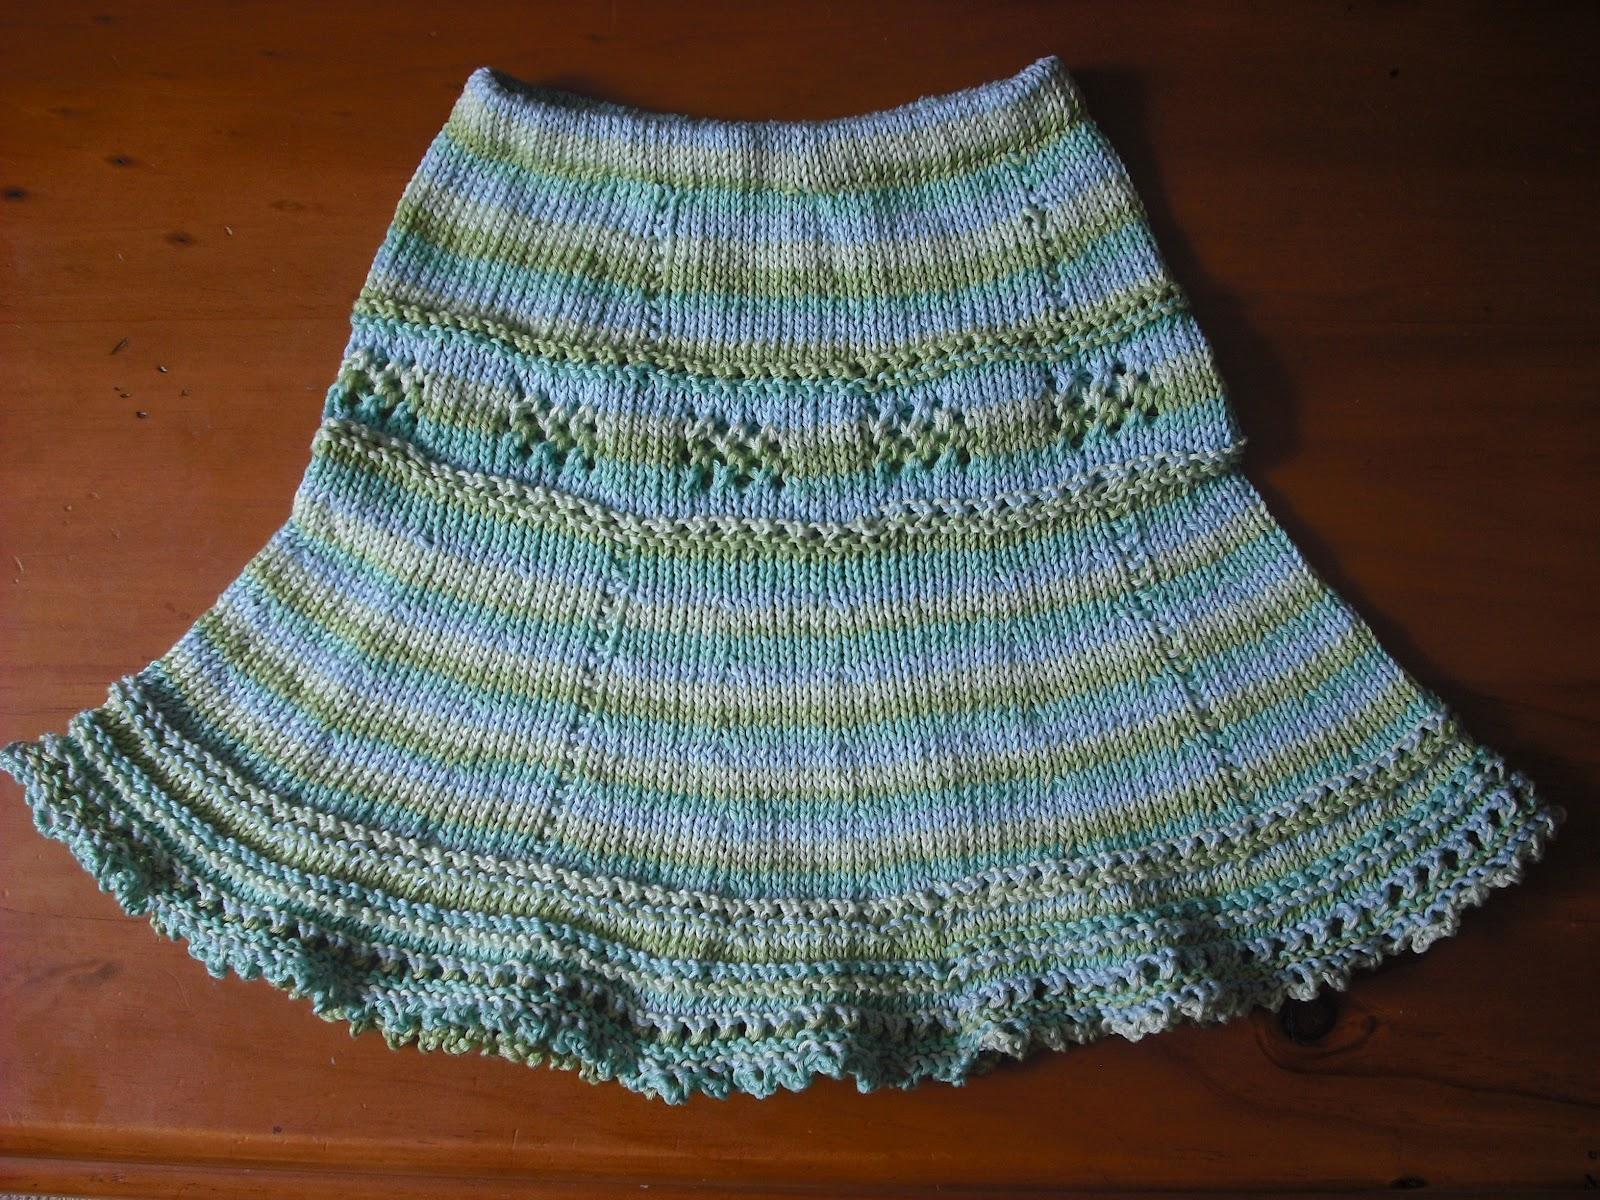 Knitting Ideas For Summer : Thread nique summer knitting ideas